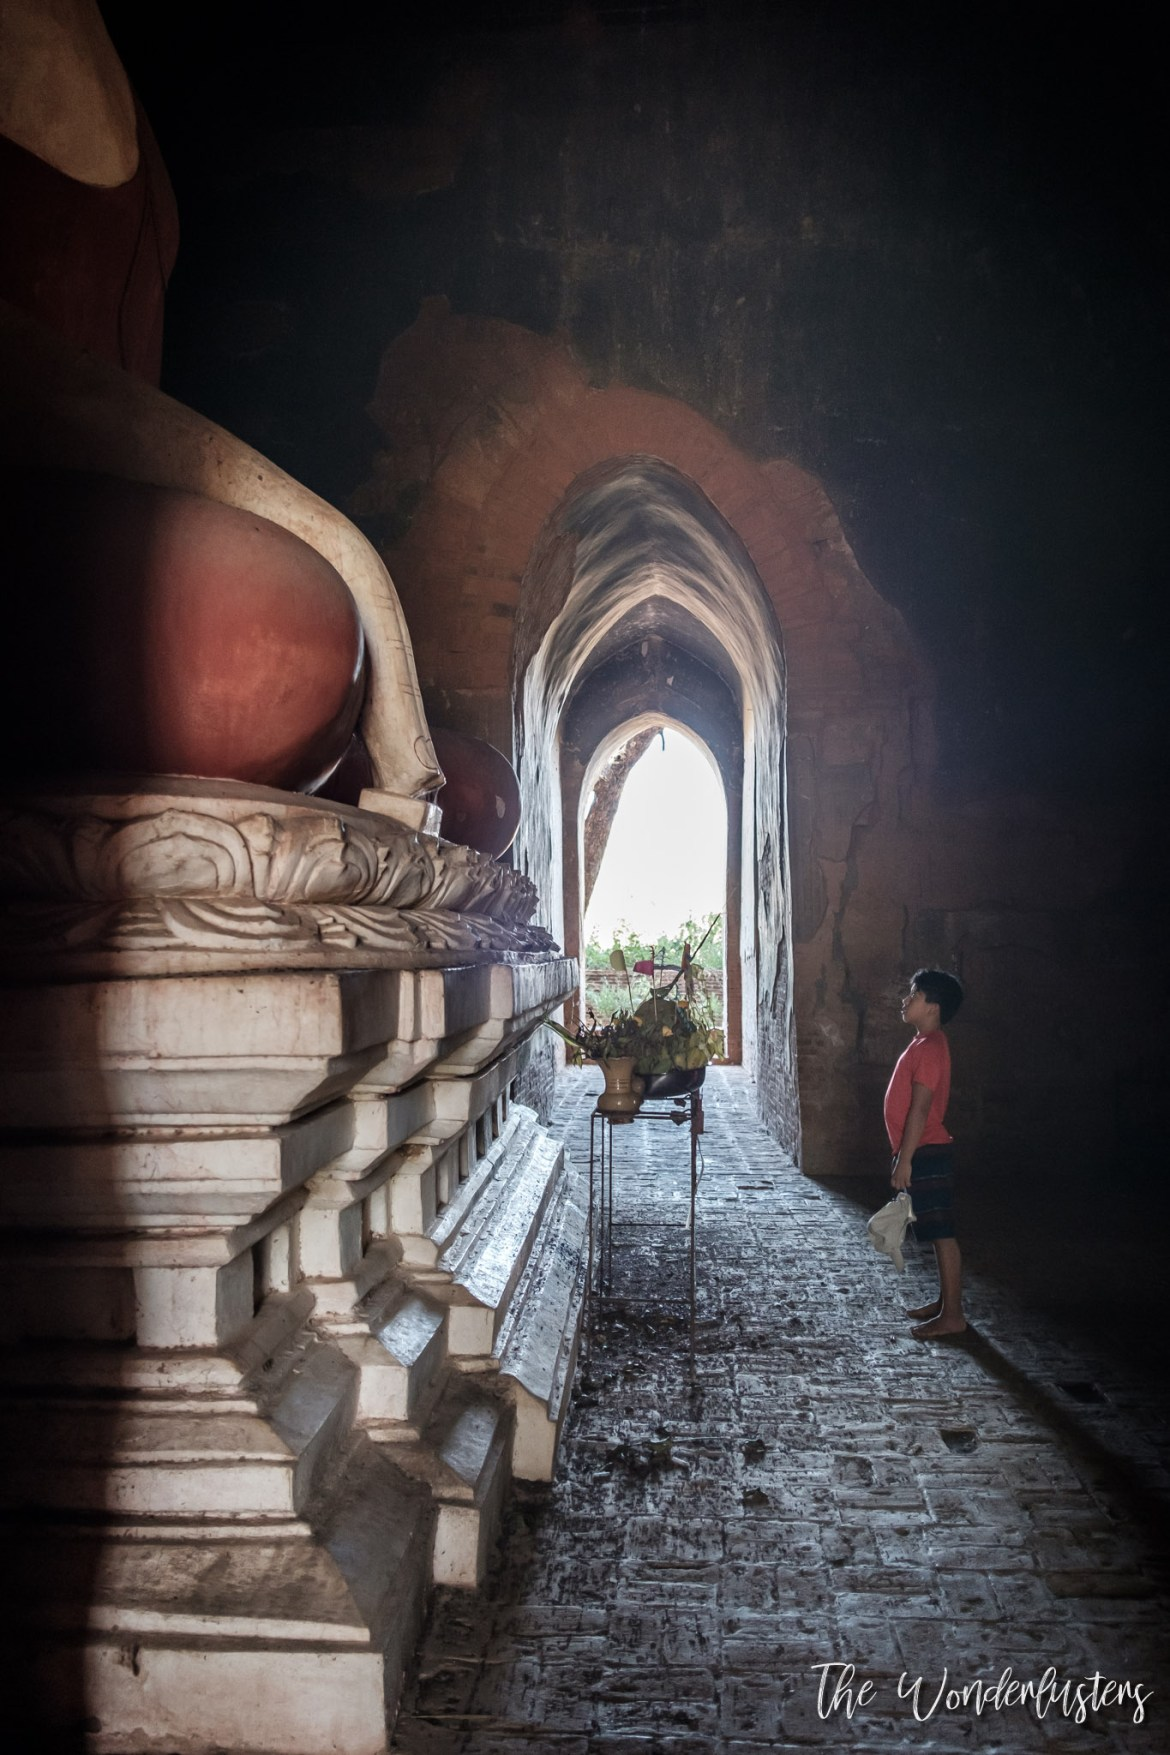 A Buddha inside a temple